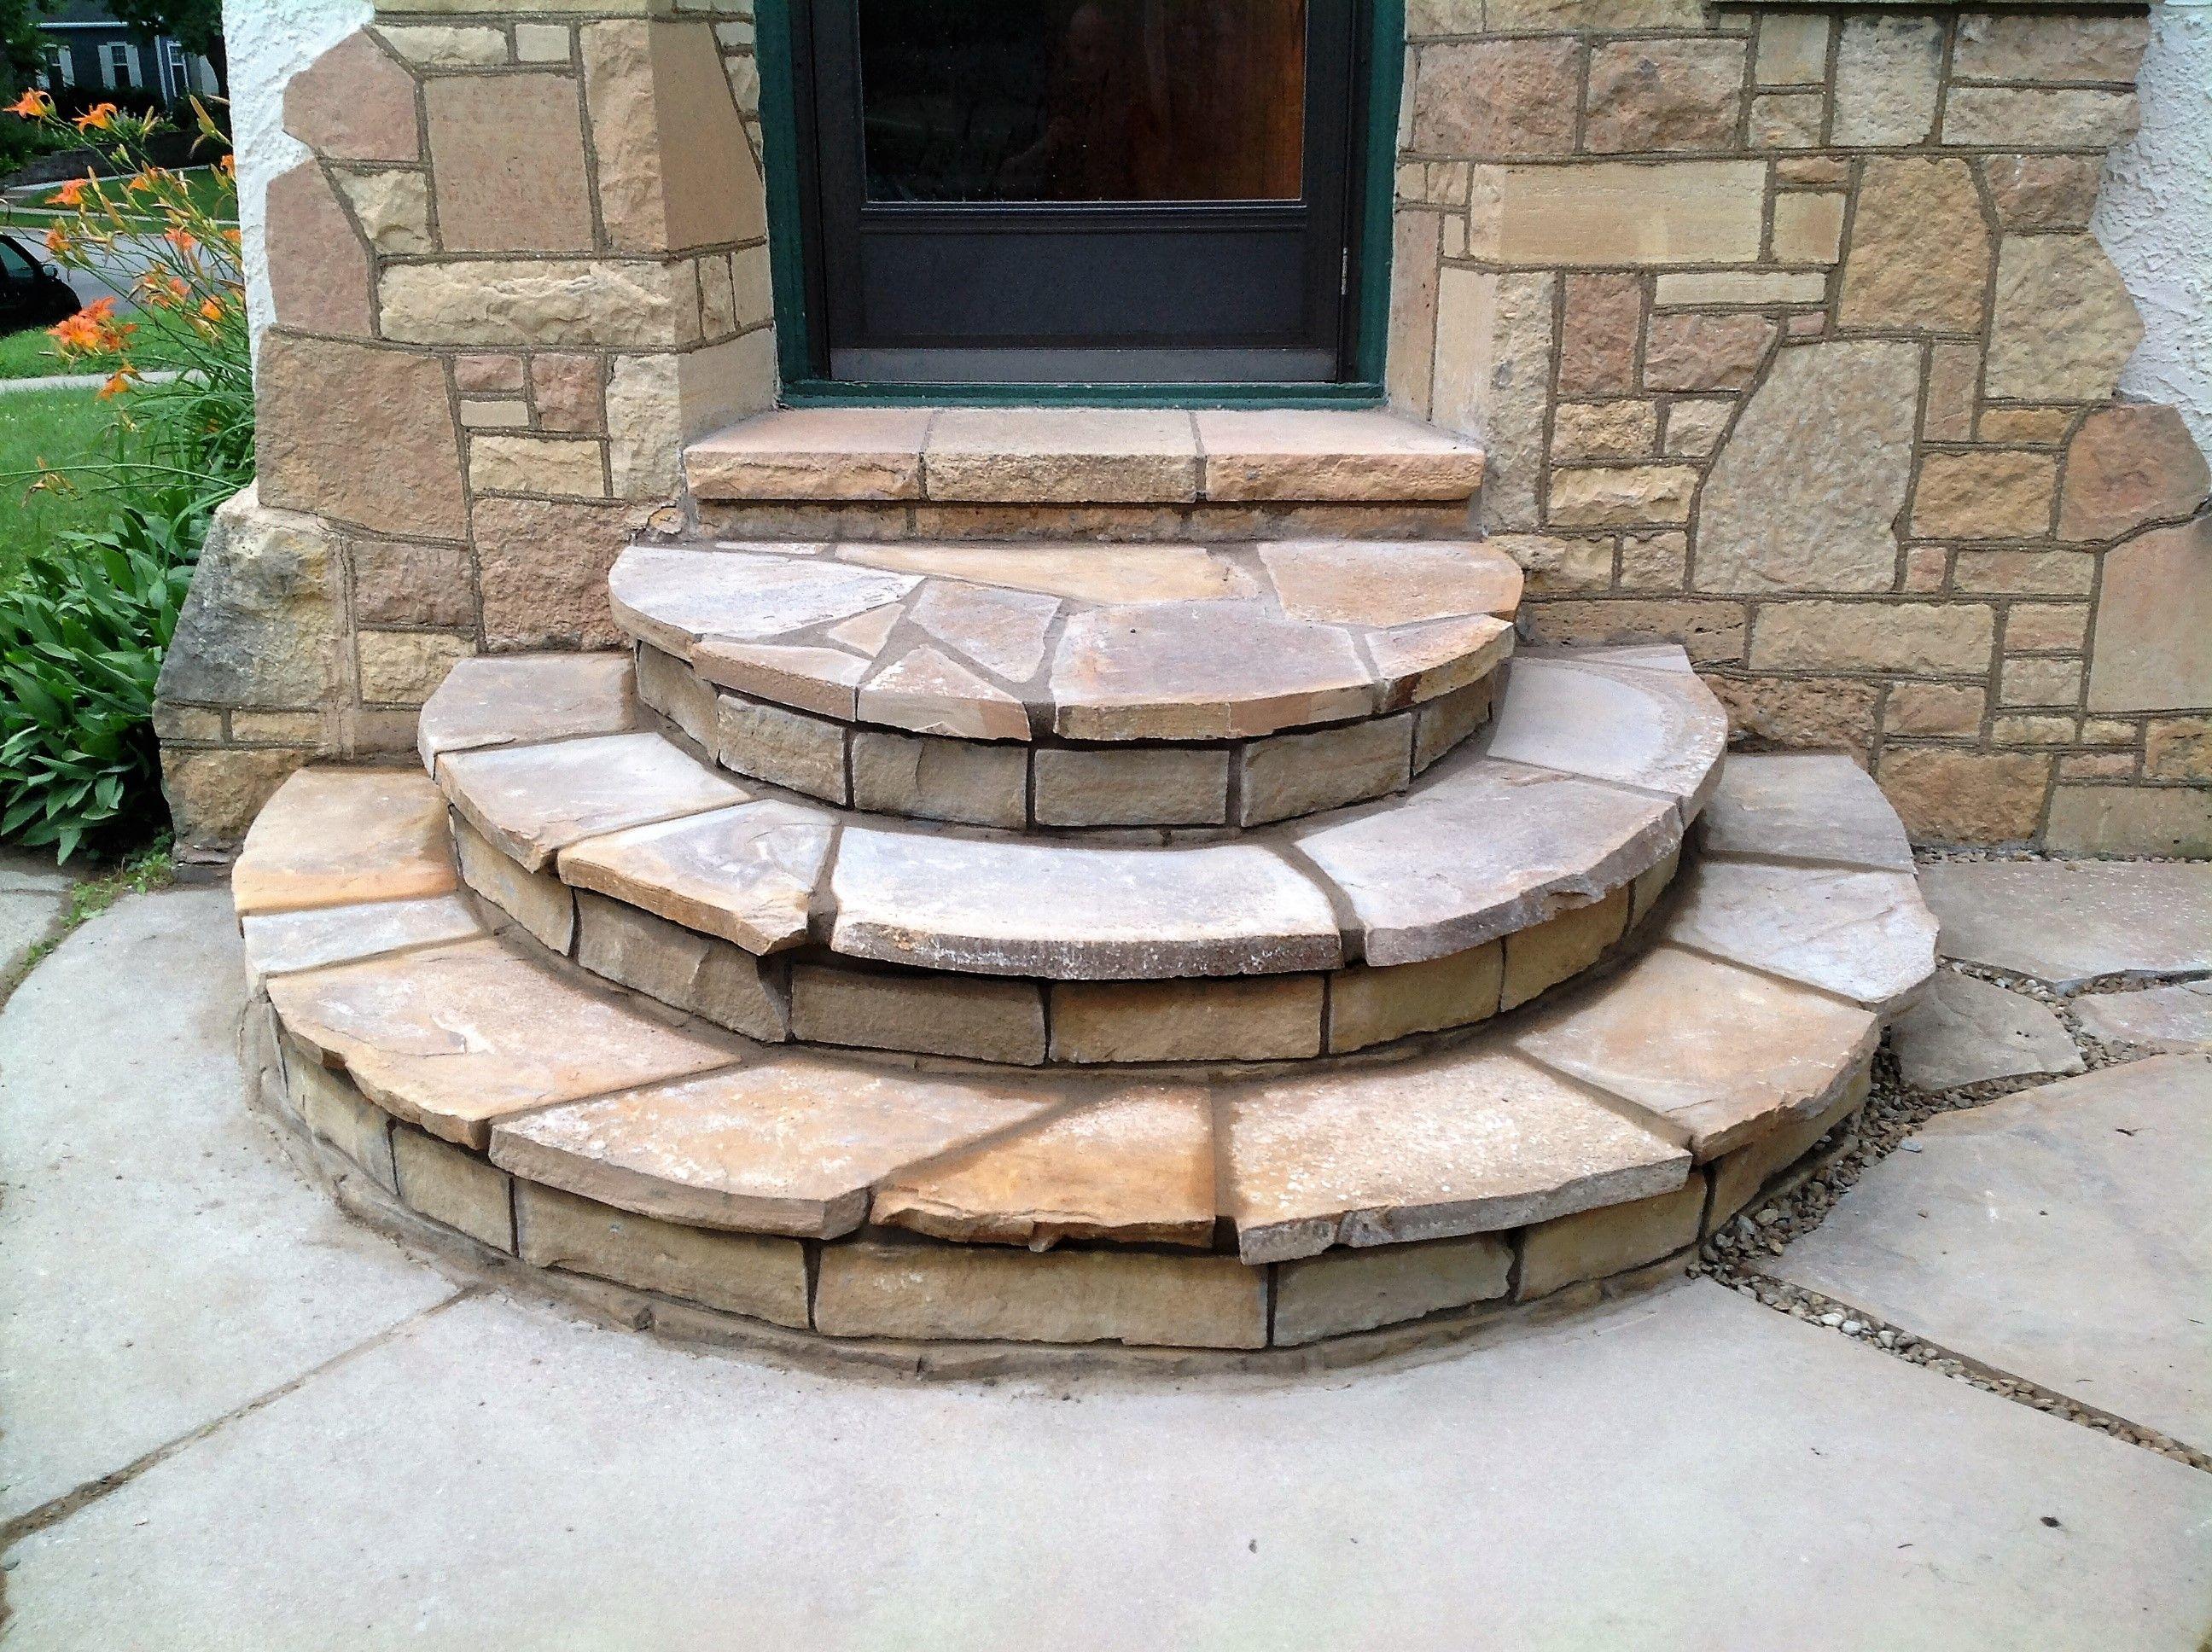 Desert bronze sandstone flagstone step overlay patio